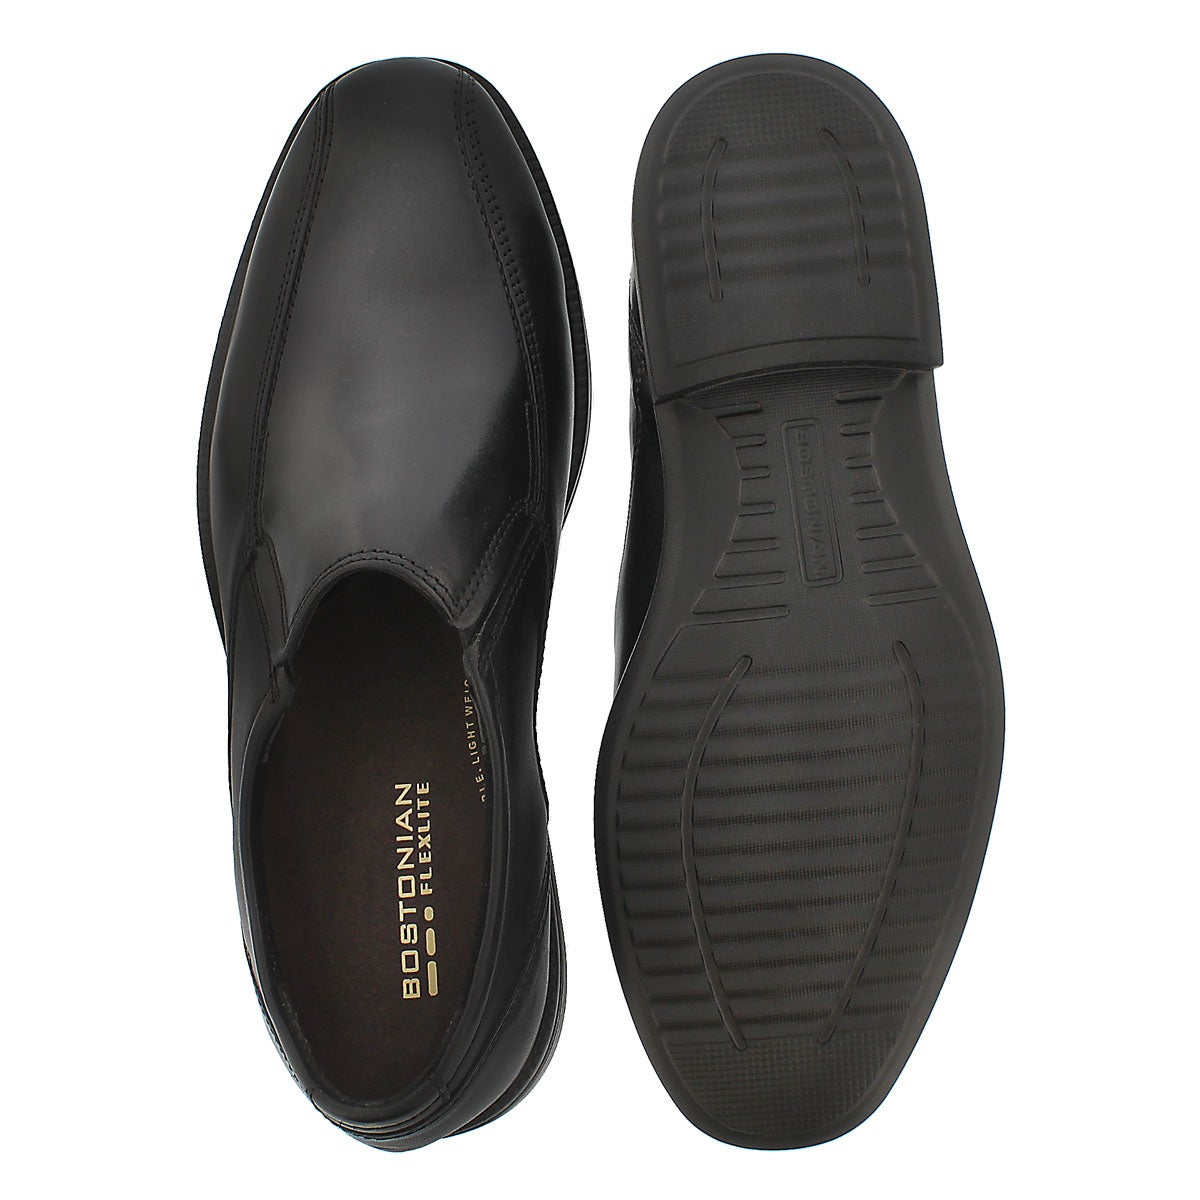 Mns Bardwell Step blk slip on dress shoe